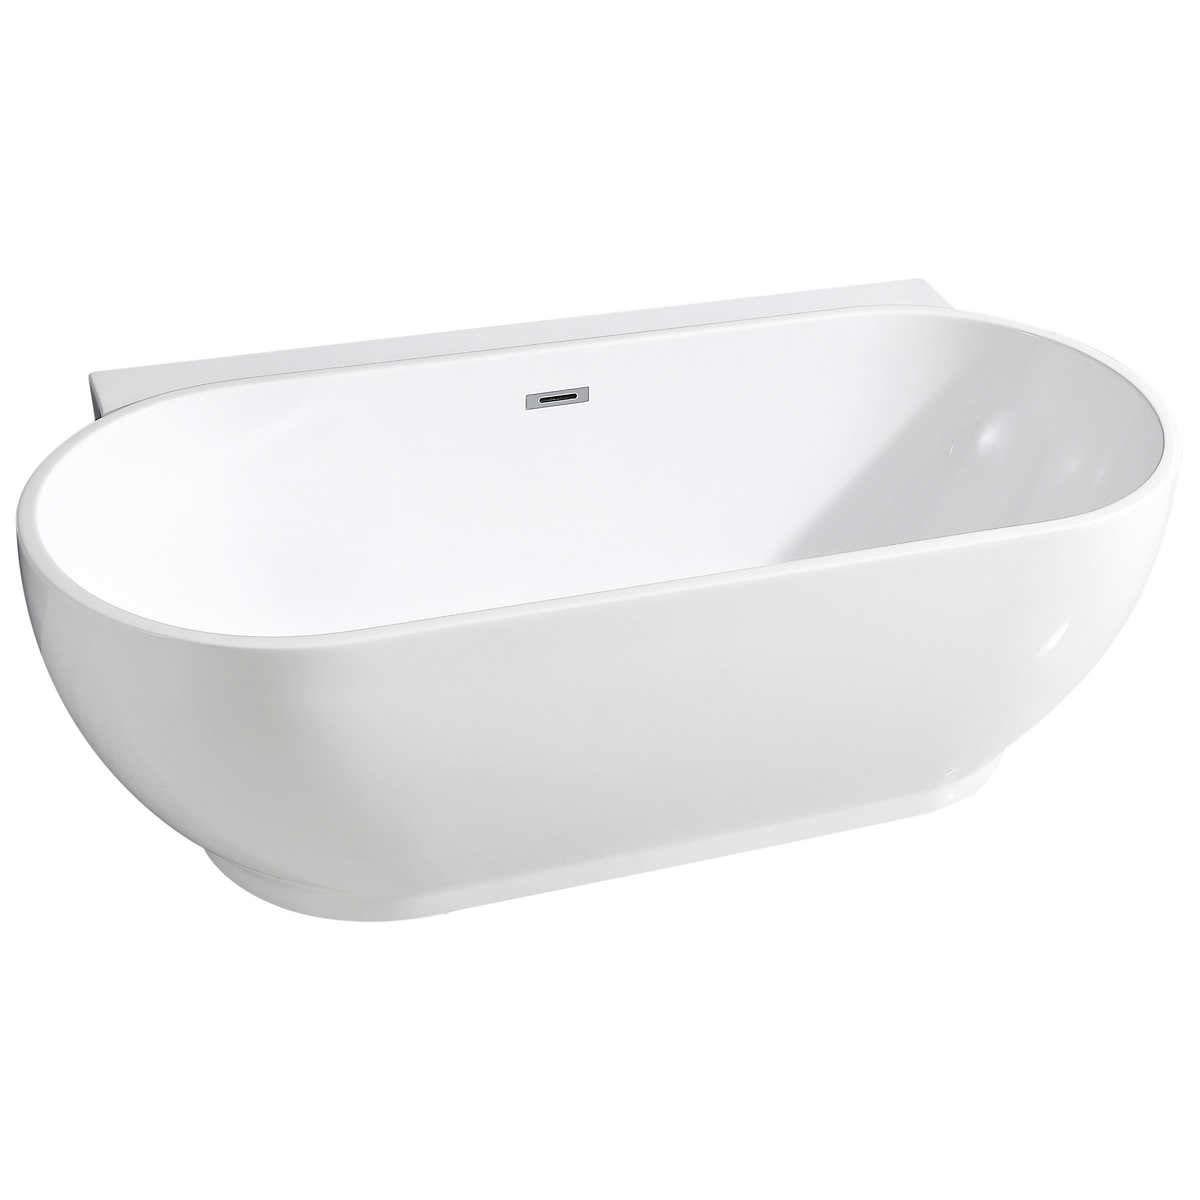 3 mm Acrylic Reinforced Fiberglass OVE Enzo 66 in Bathtub Freestanding Seamless Bathtub Freestanding